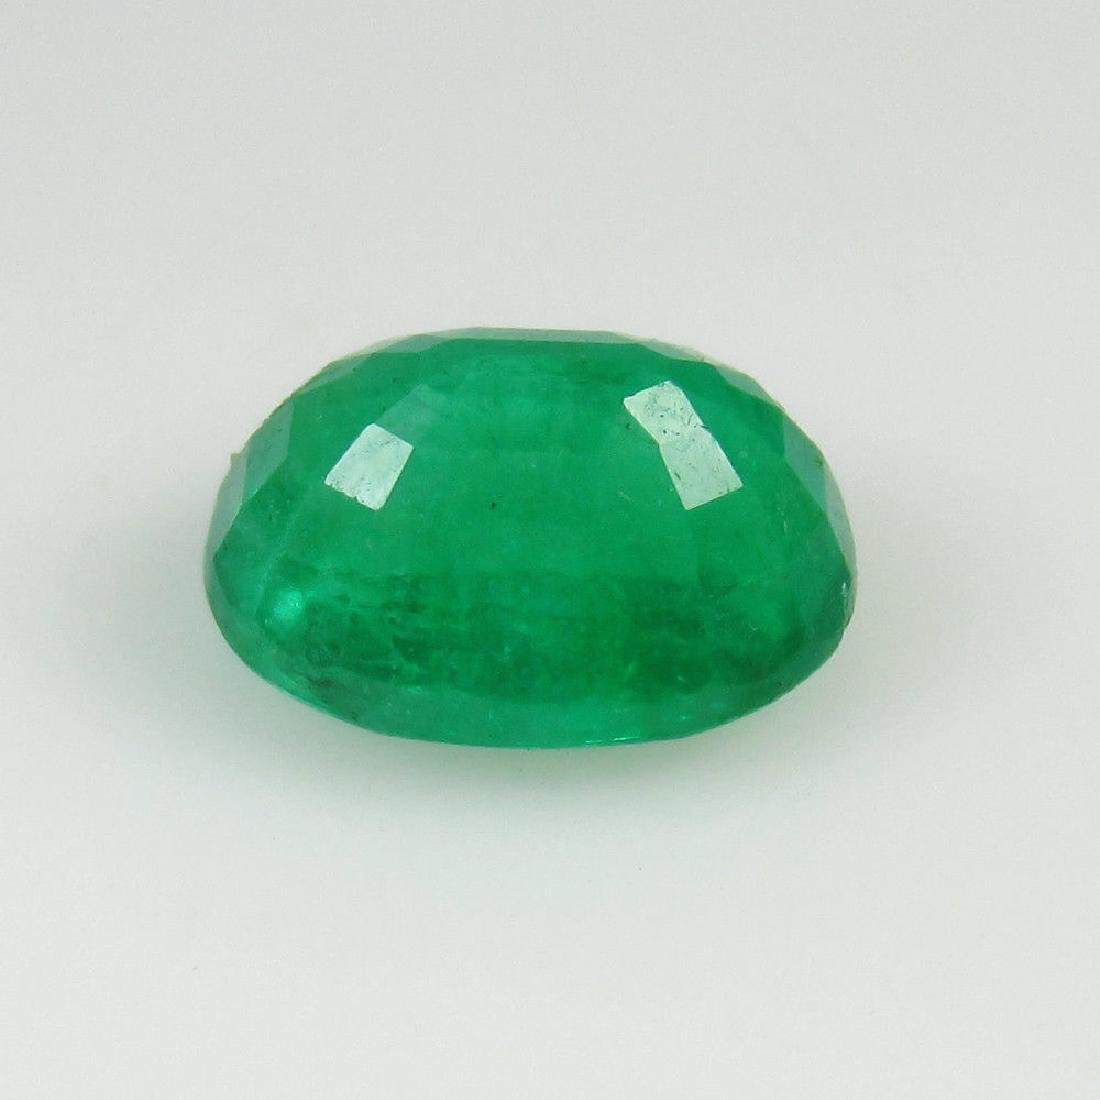 1.95 Ct Genuine Zambian Emerald Top Quality AAA++ Green - 4